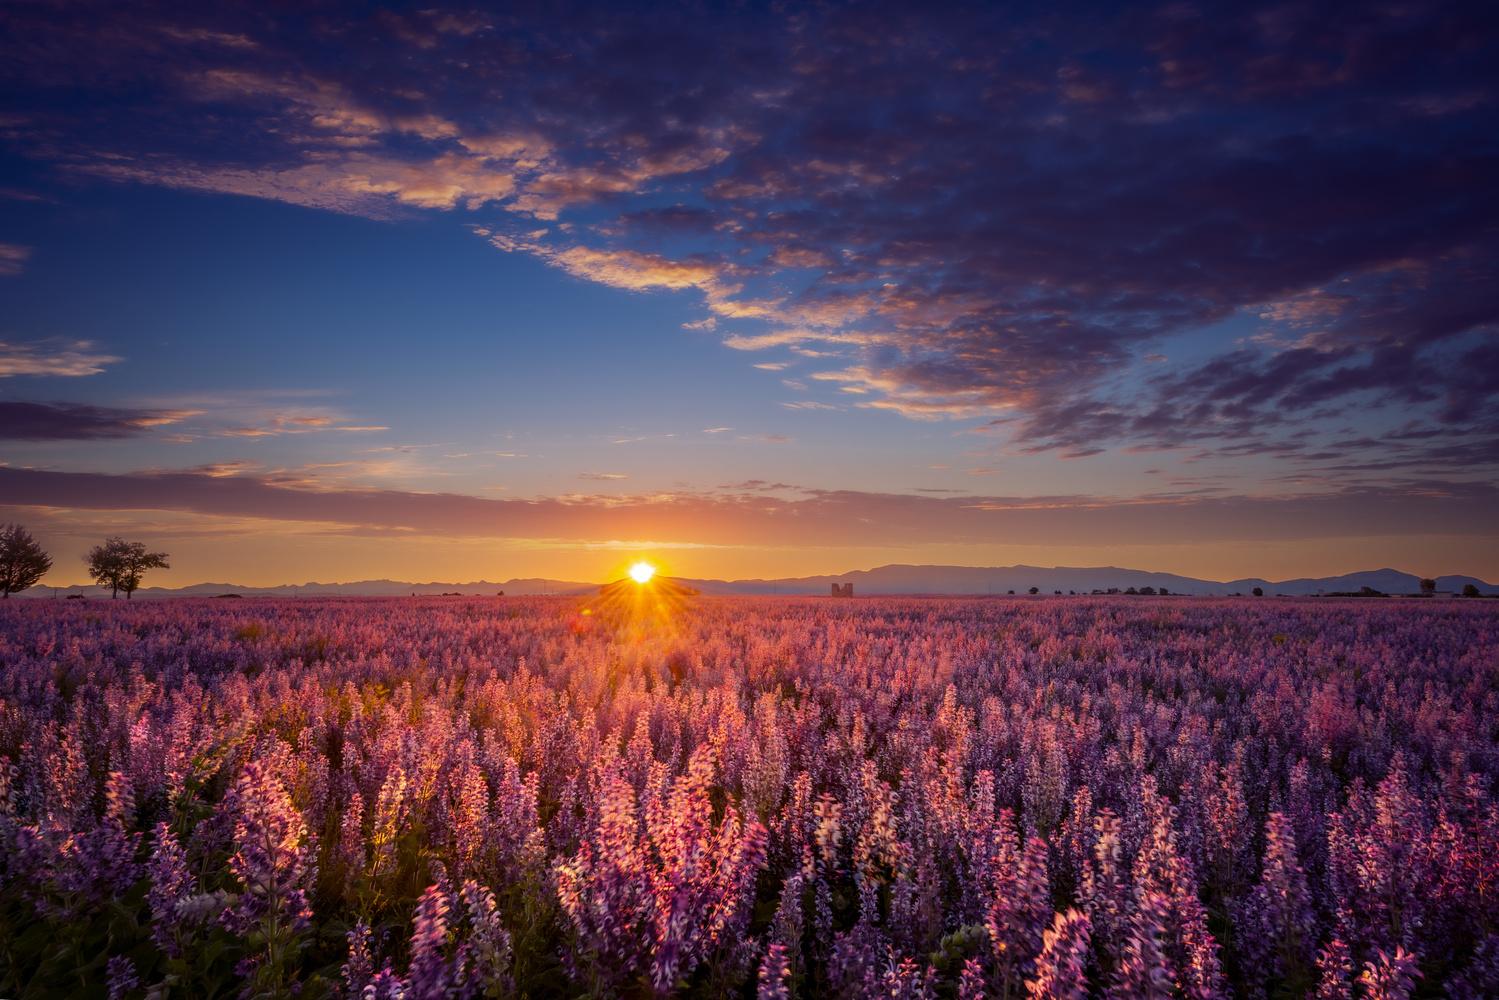 Morning Light by Alex Hill